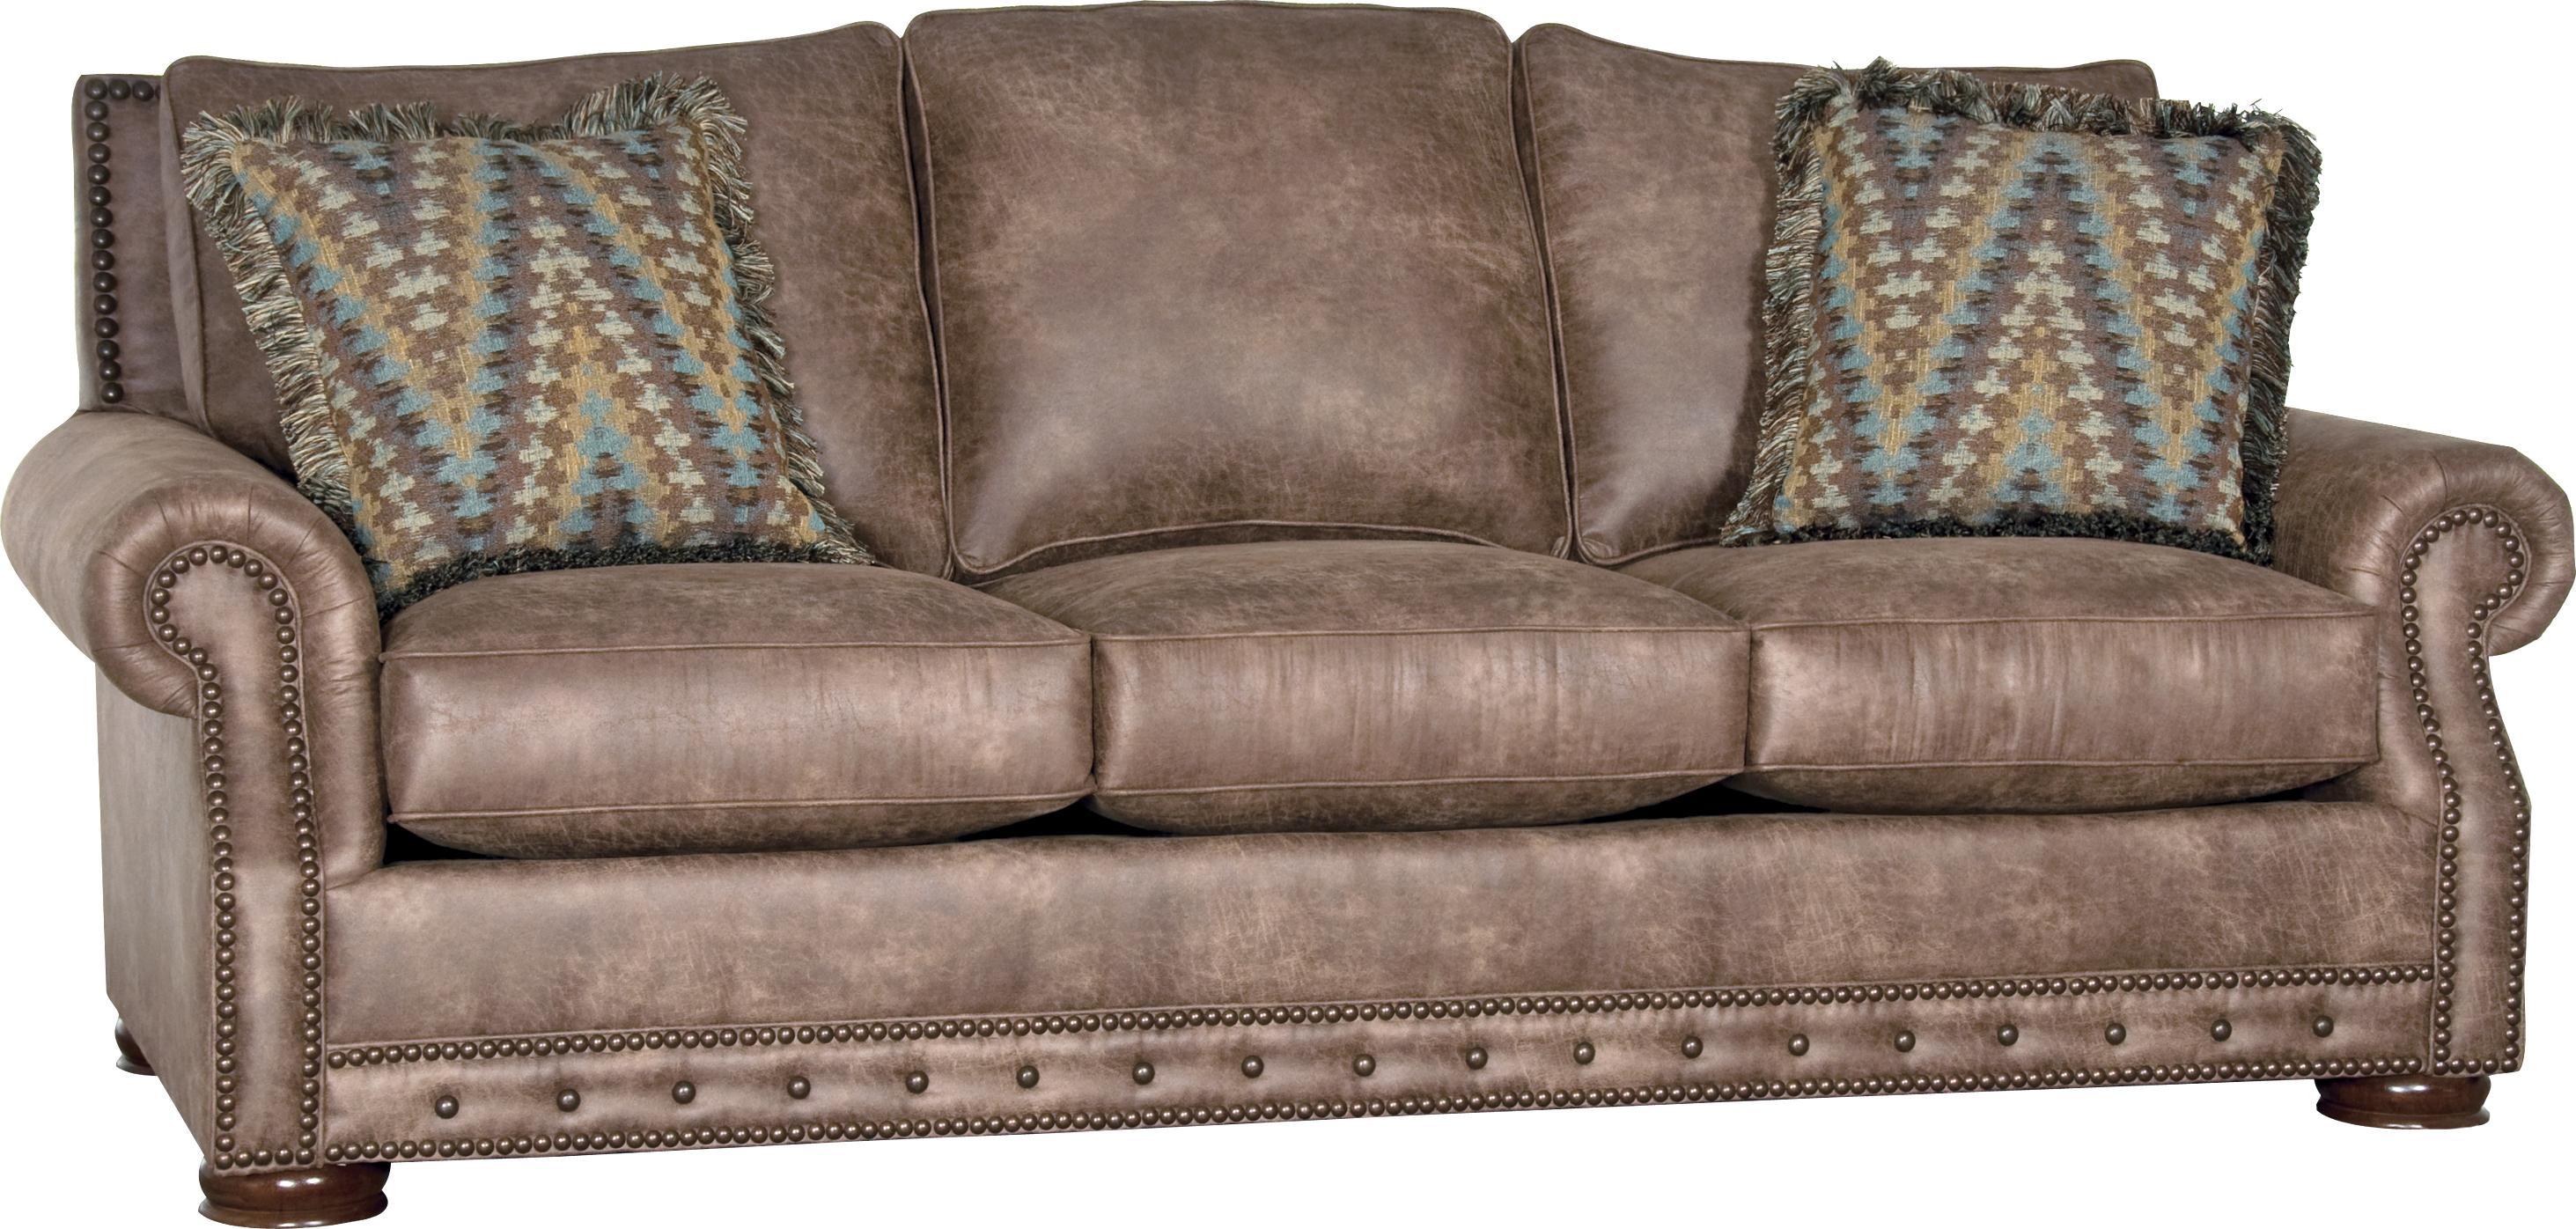 Mayo 2900 Traditional Sofa With Low Bun Feet Olinde 39 S